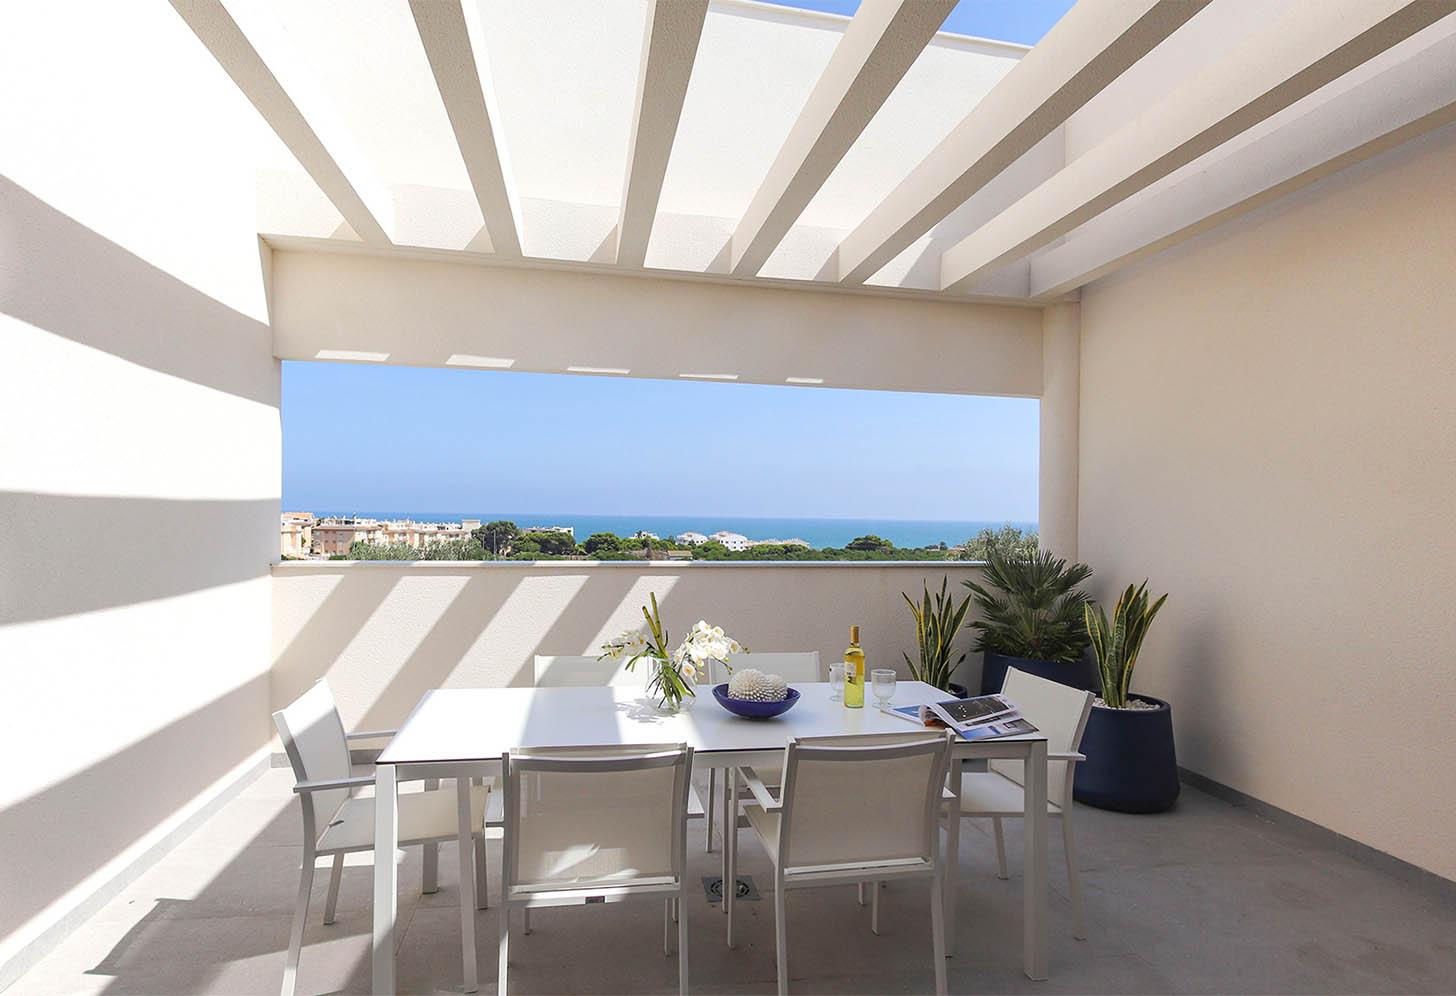 immobilier neuf espagne costa blanca on-3b essence penthouse terrasse